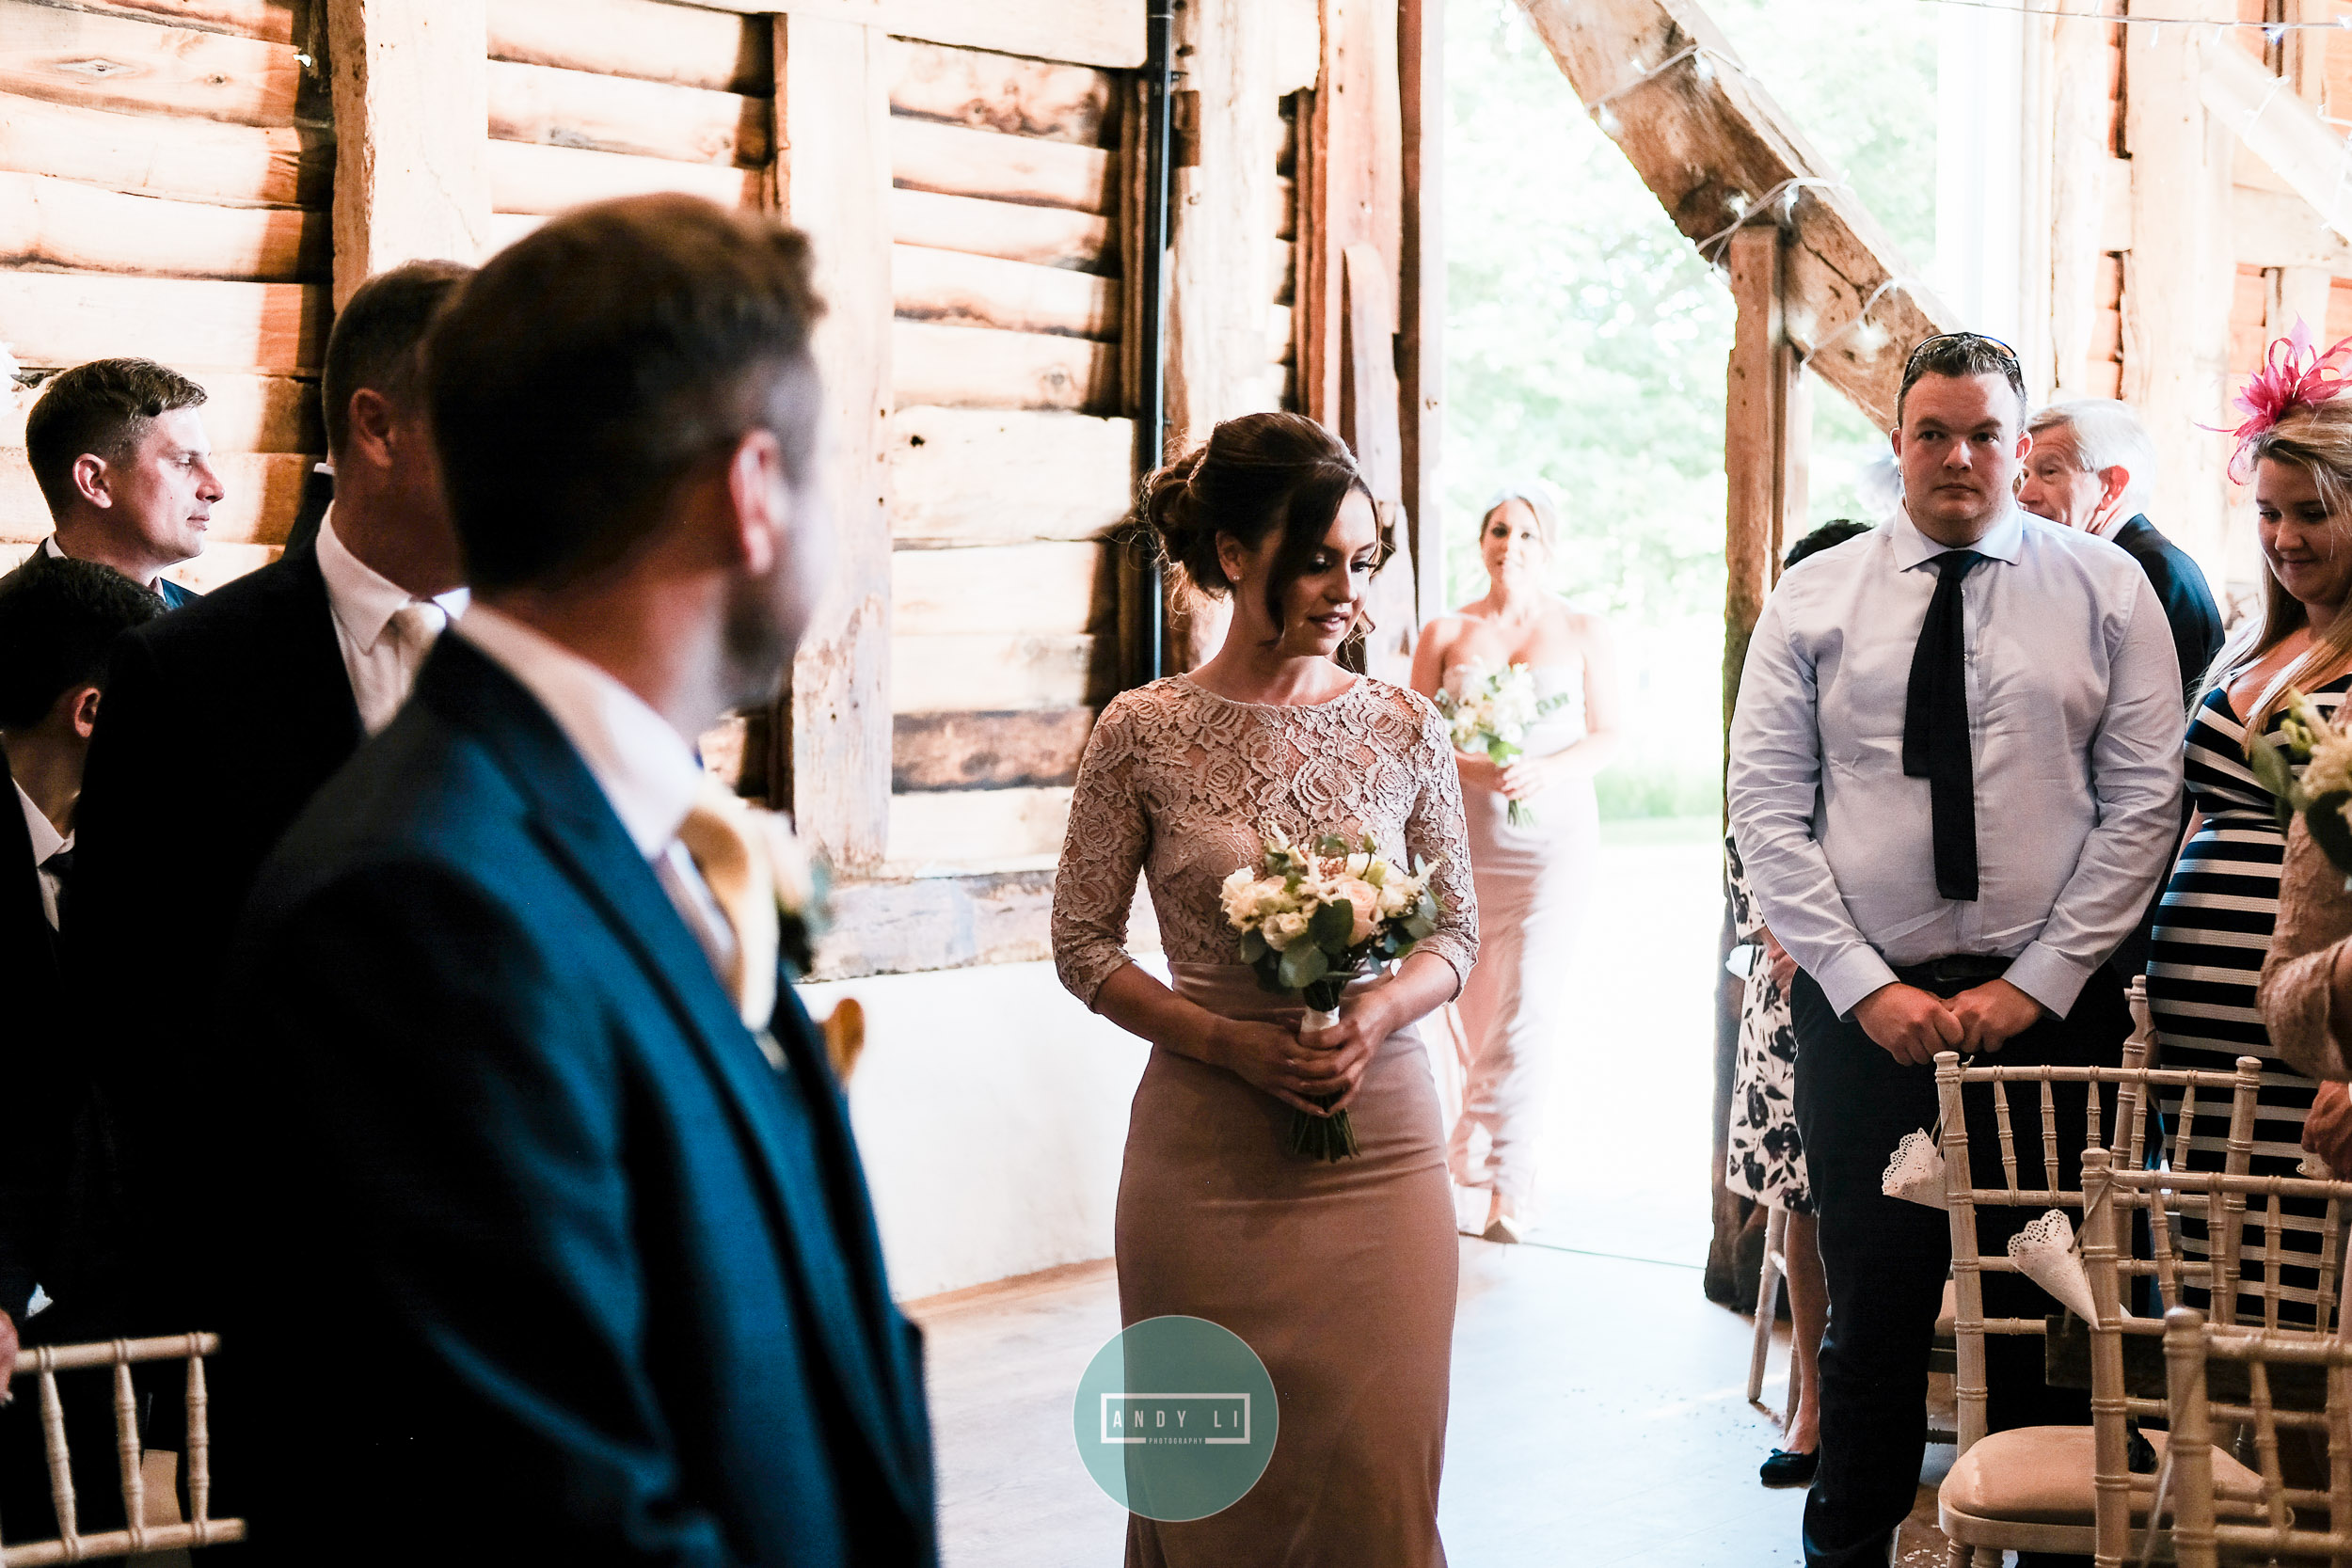 Pimhill Barn Wedding Photographer-056-DSCF0111.jpg